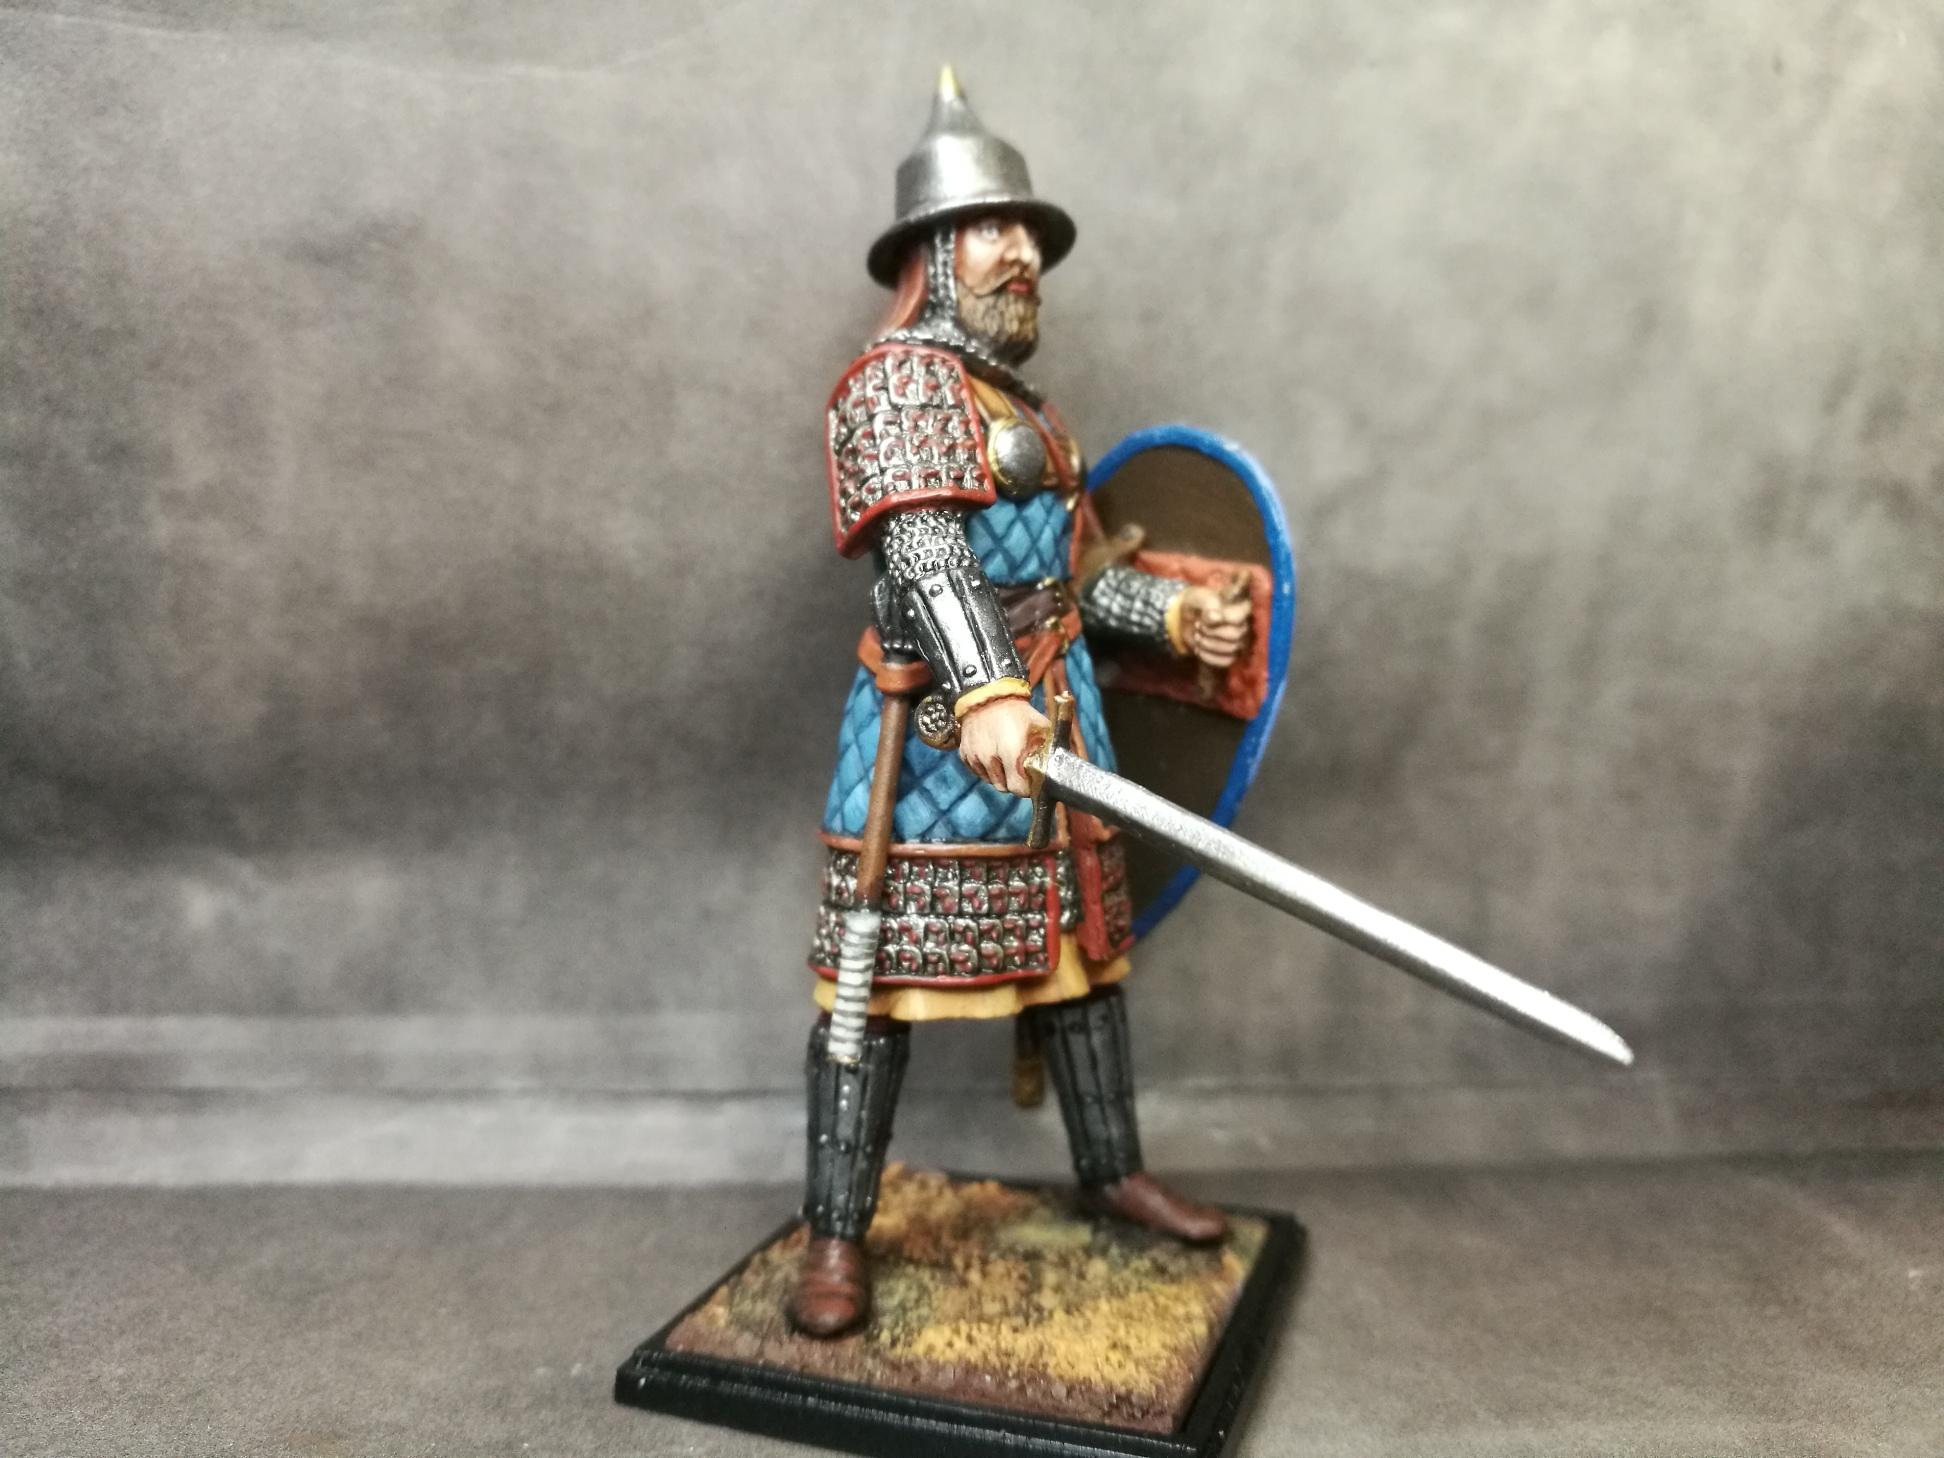 Byzantine soldier, byzantine army, βυζαντινοσ στρατιωτης, βυζαντινος στρατος,